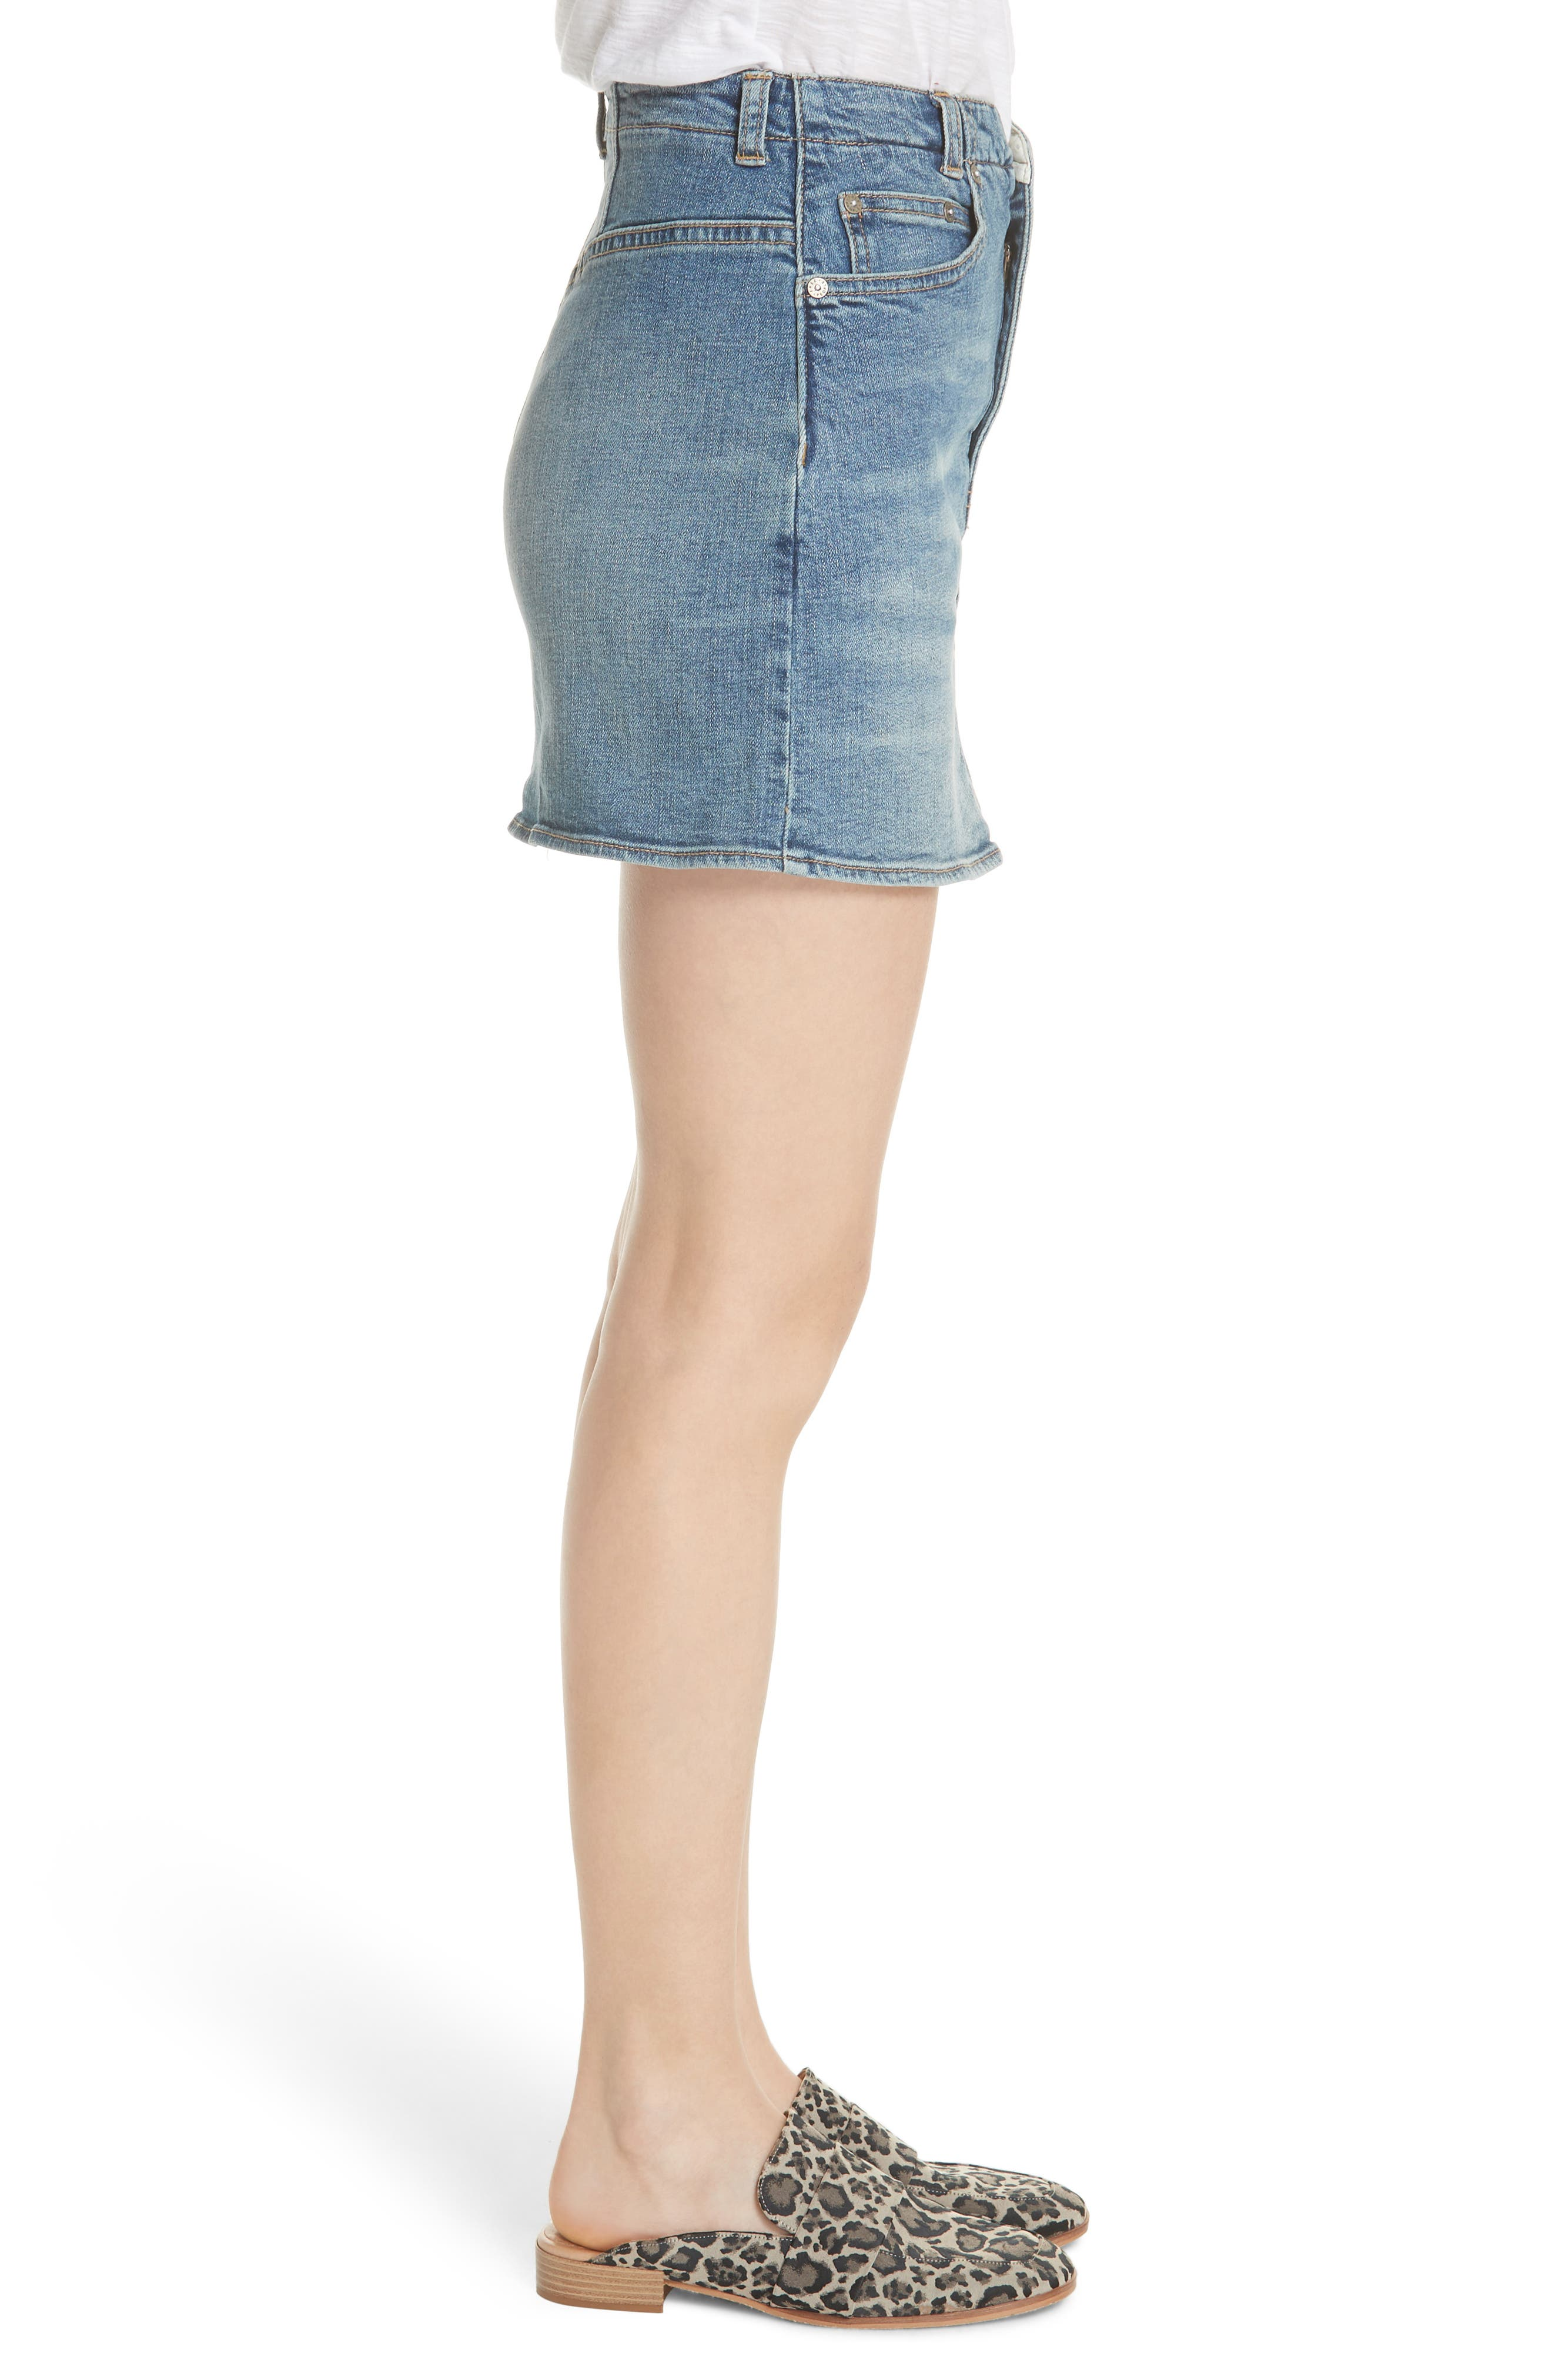 FREE PEOPLE,                             She's All That Denim Miniskirt,                             Alternate thumbnail 3, color,                             425